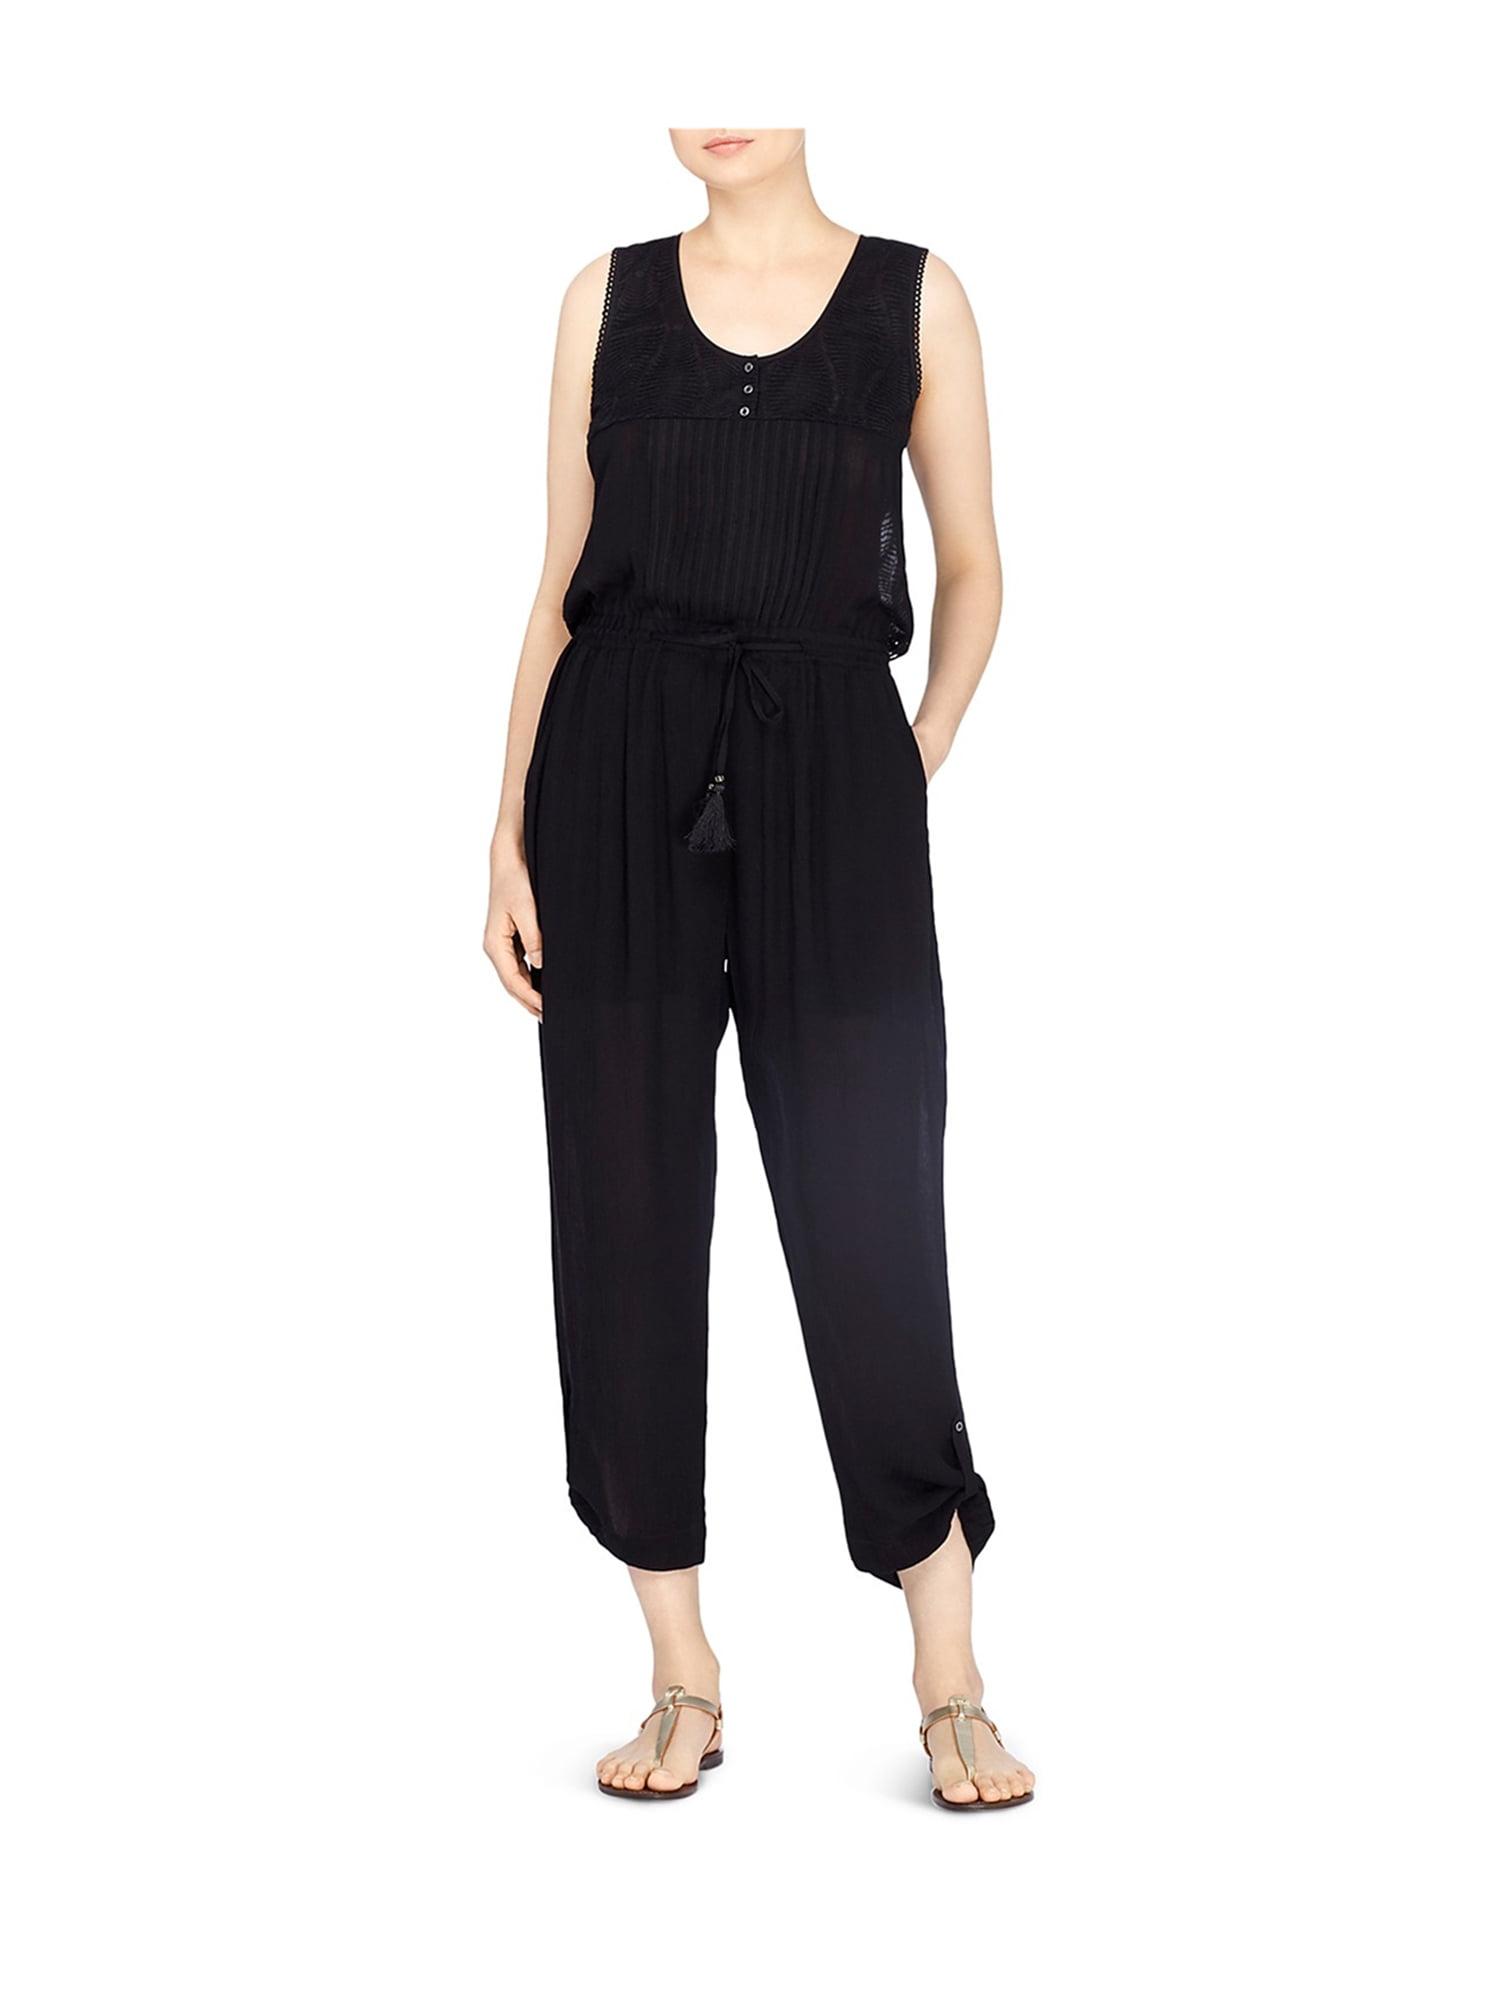 e6df5630852 Catherine Malandrino Womens Embroidered Jumpsuit blackbeauty XL